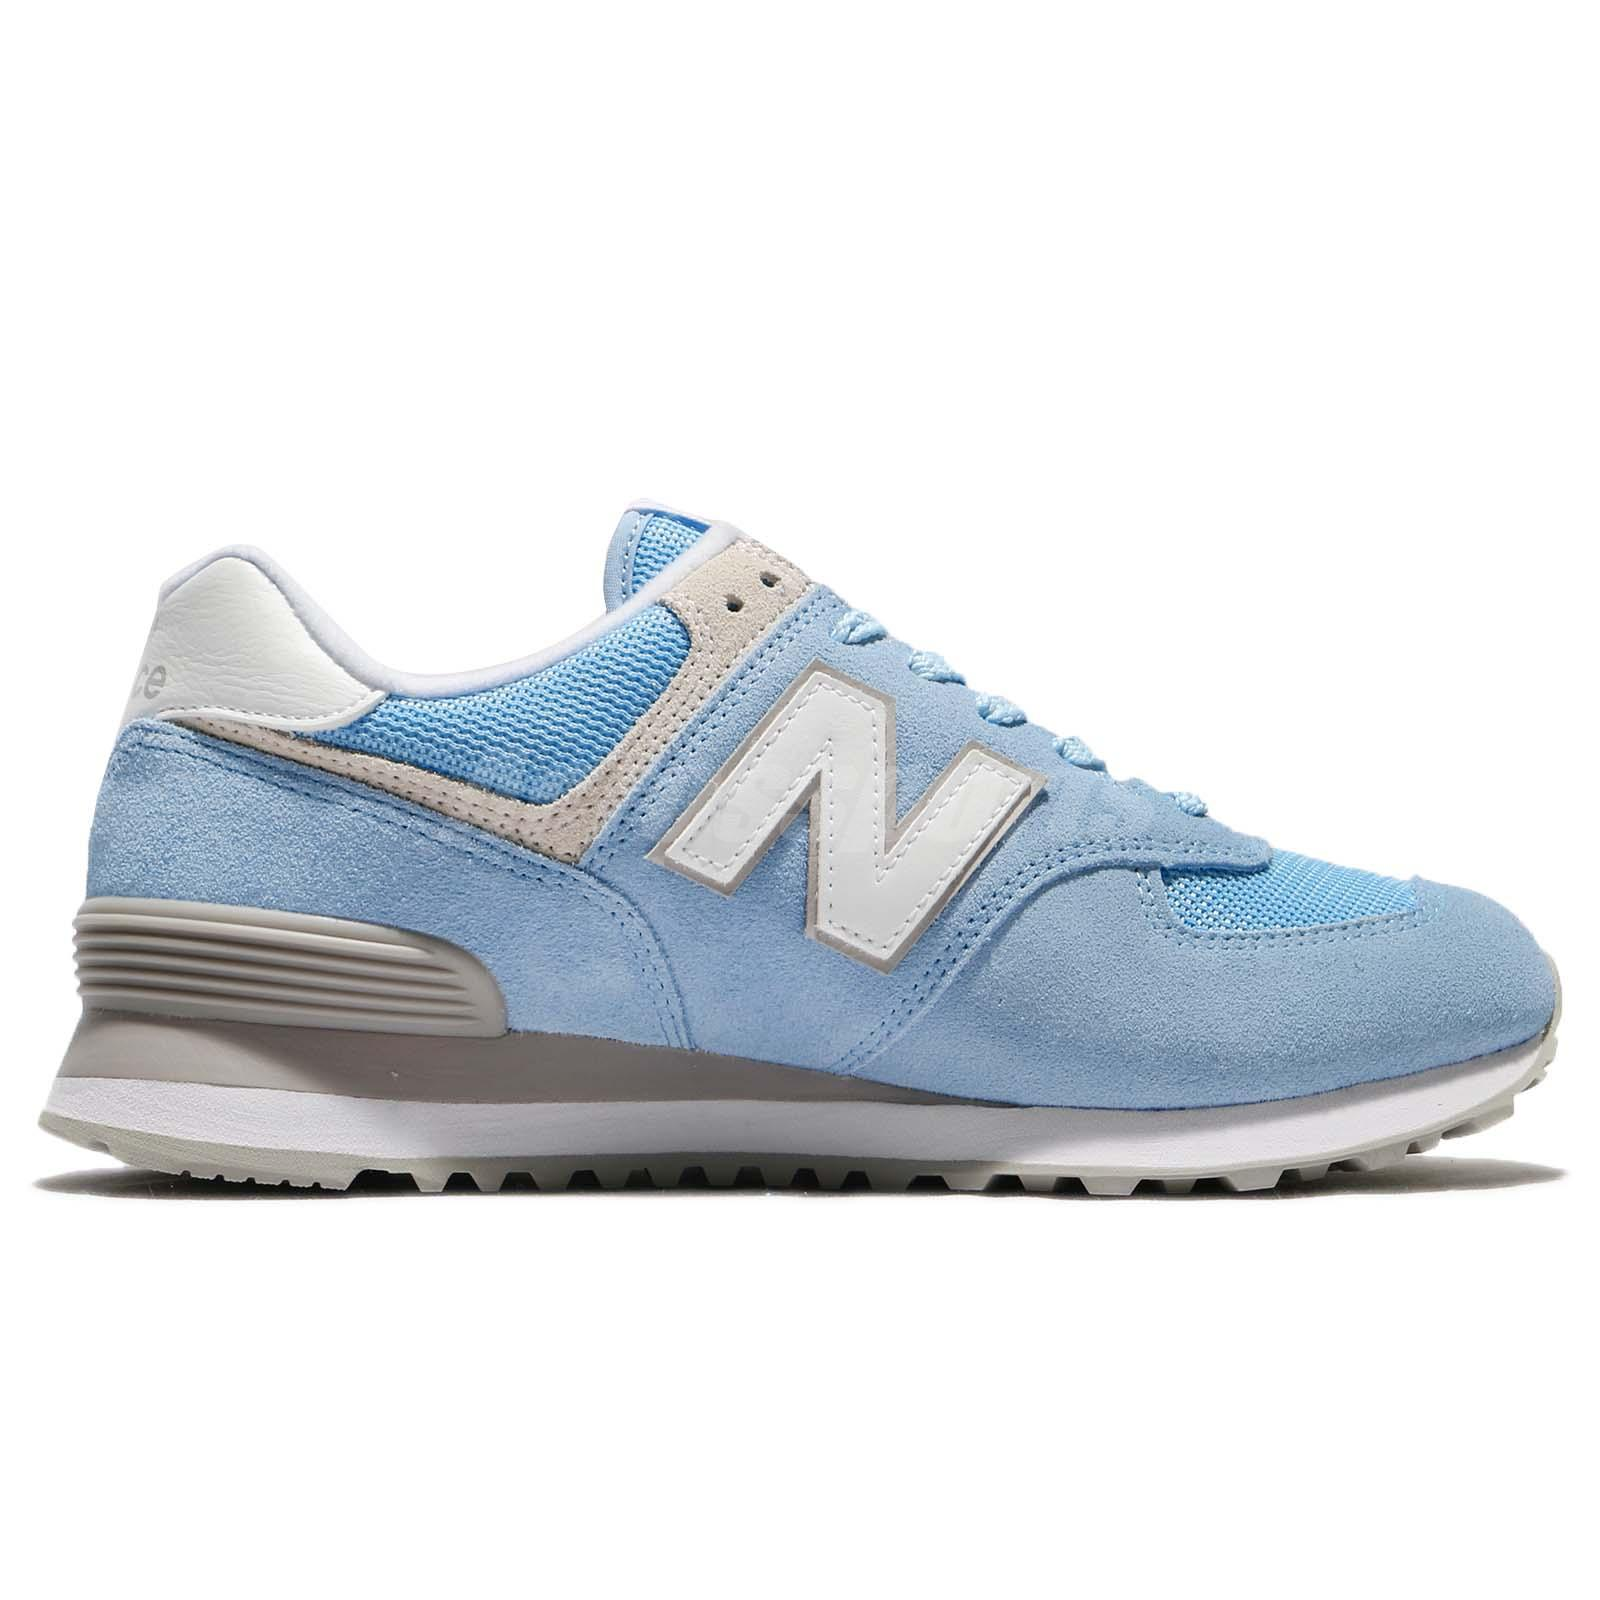 New Balance WL574ESB B 574 Blue White Women Running Shoes Sneakers ... 6664b839b31